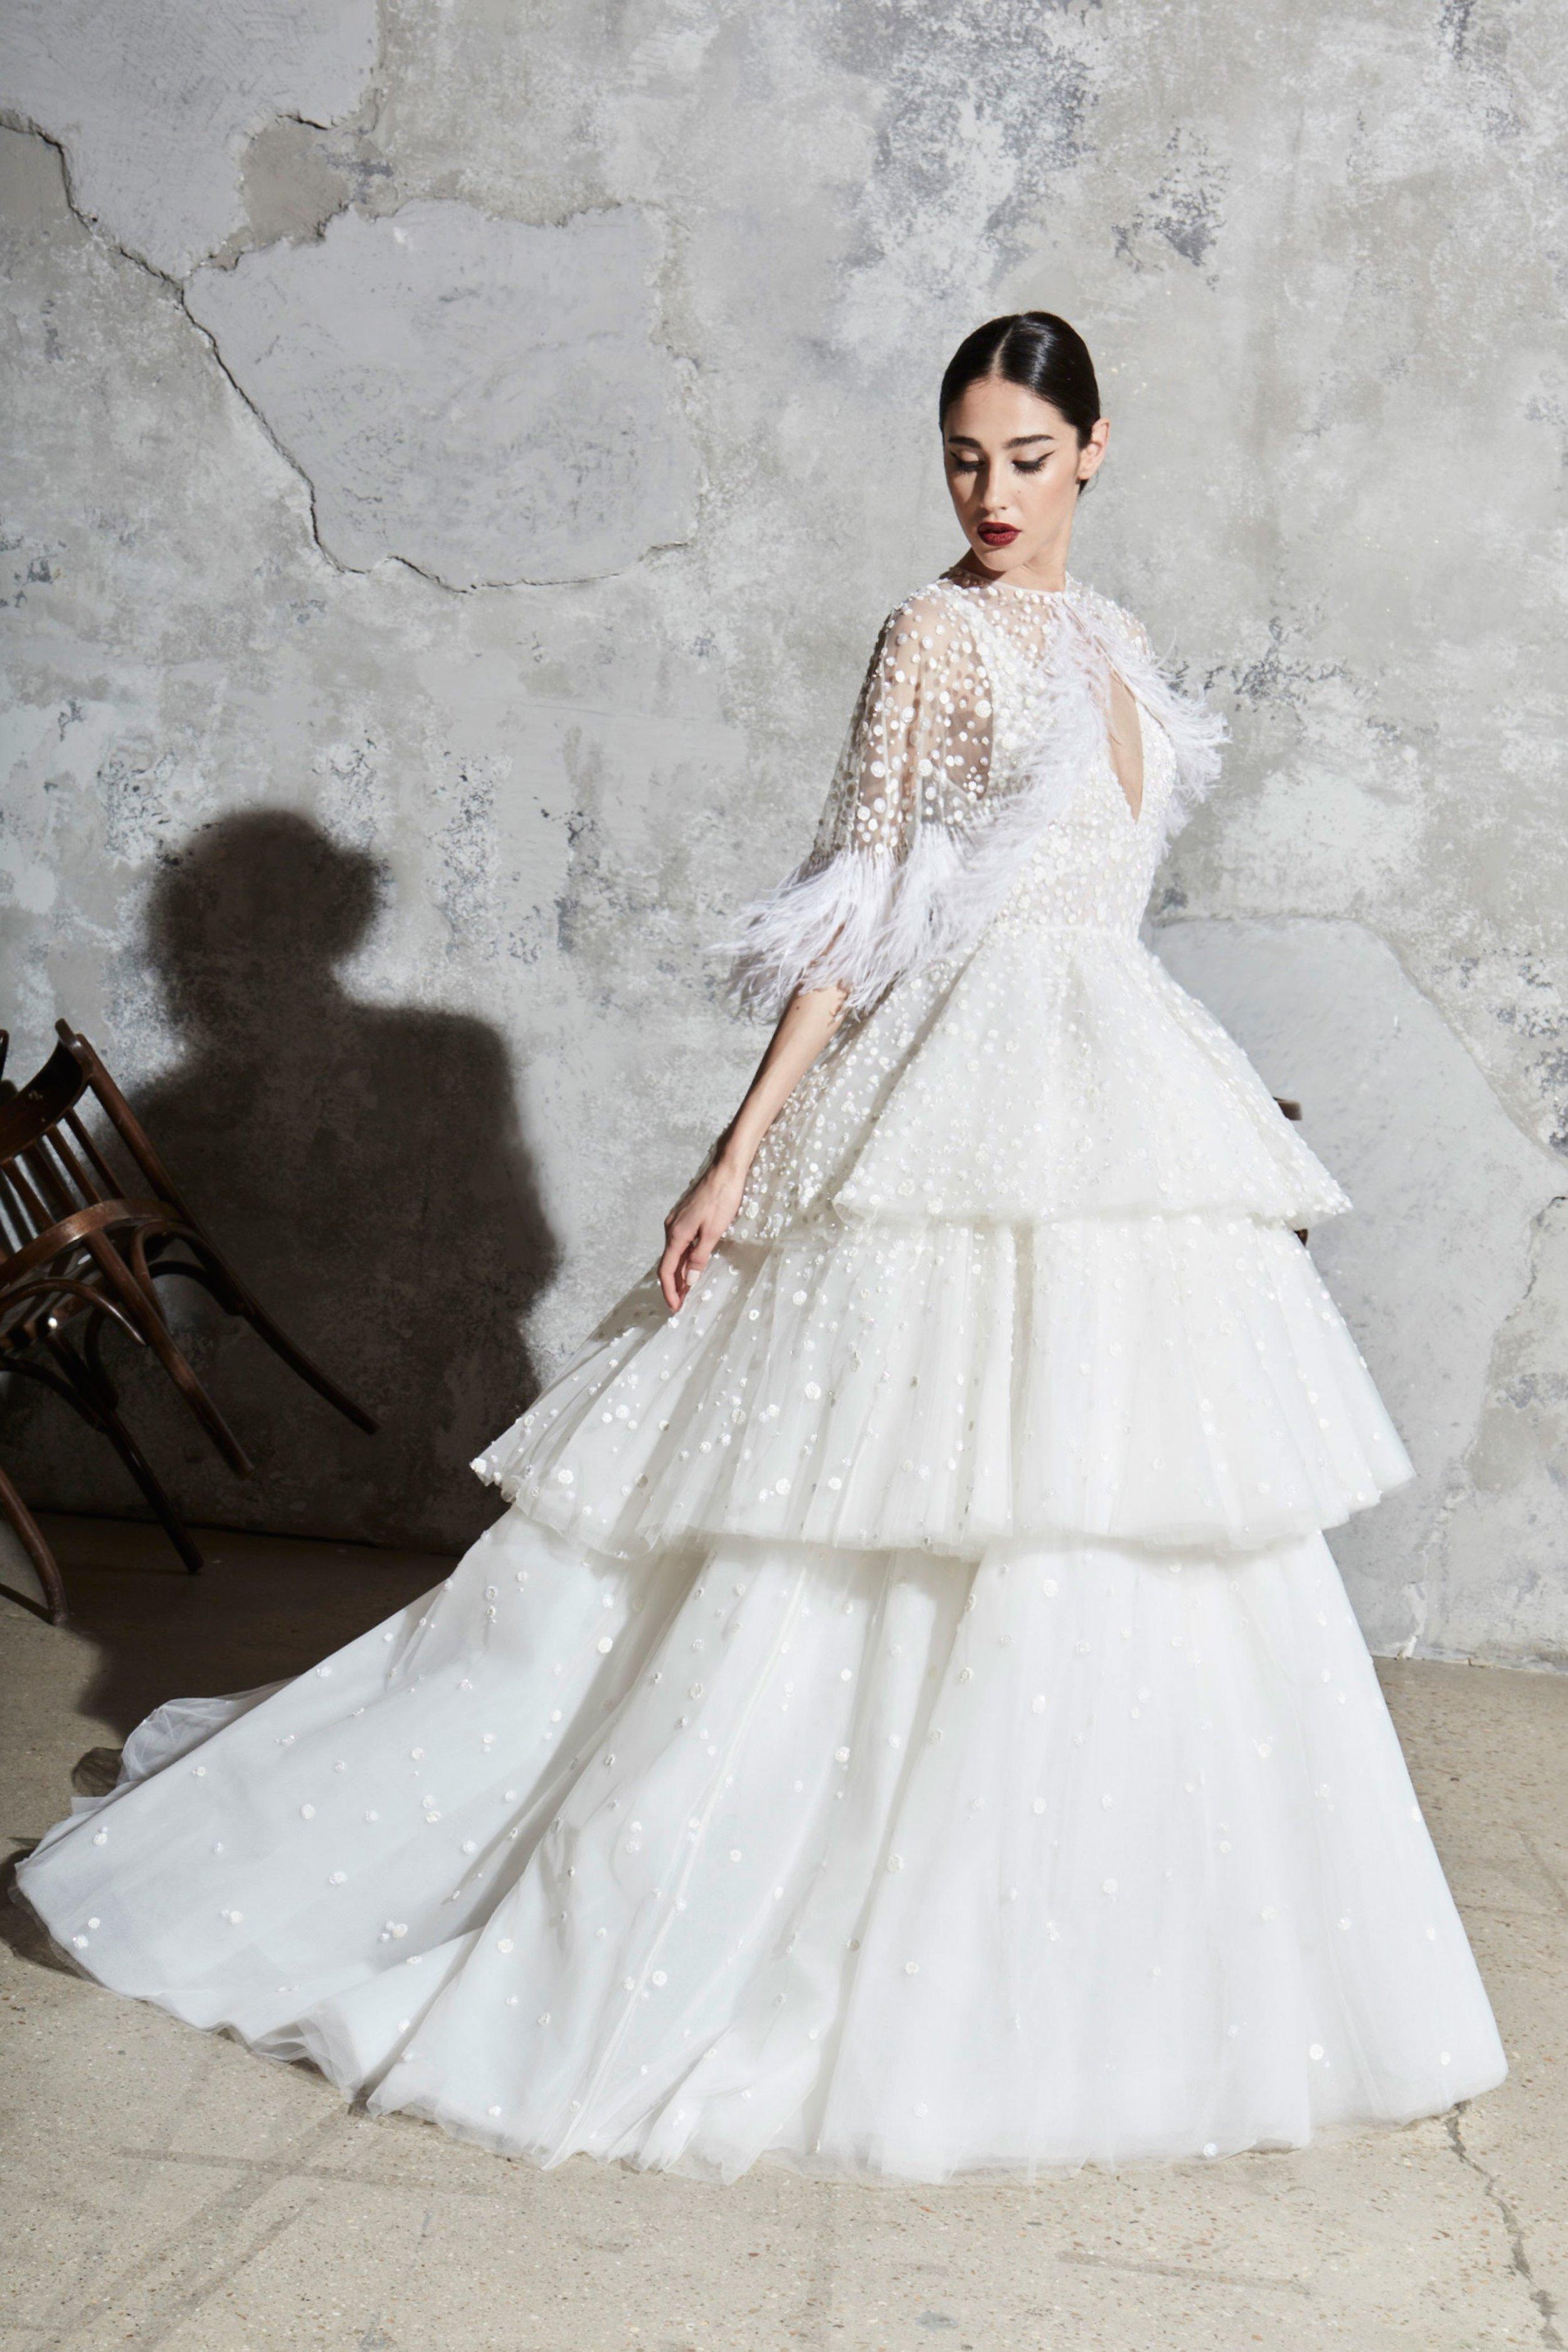 00014-zuhair-murad-new-york-bridal-Spring-2020-CREDIT-Thomas-Nutzl.jpg